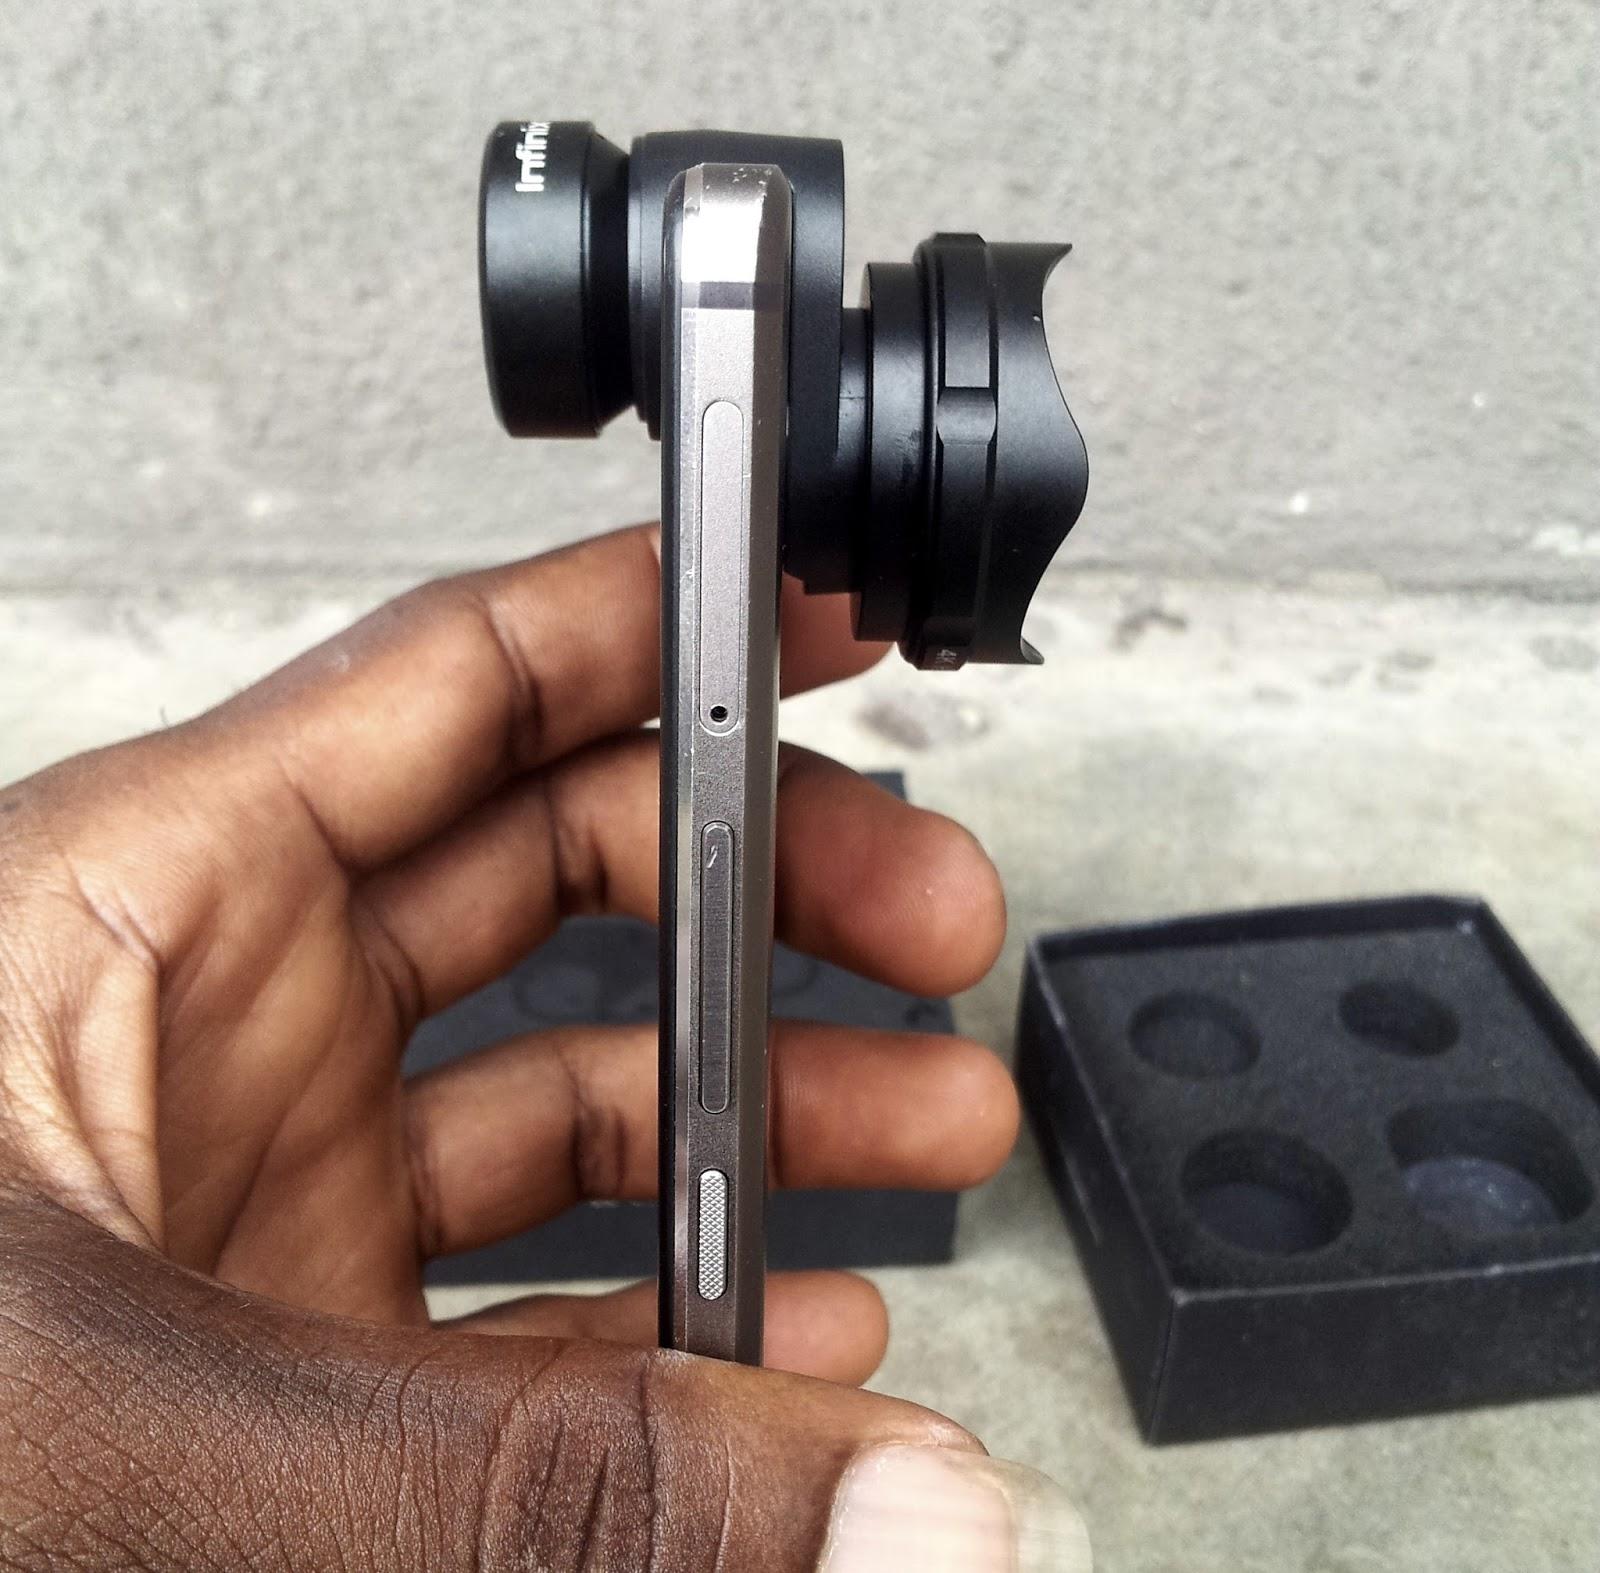 attaching lens mount to infinix zero 4 smart phone